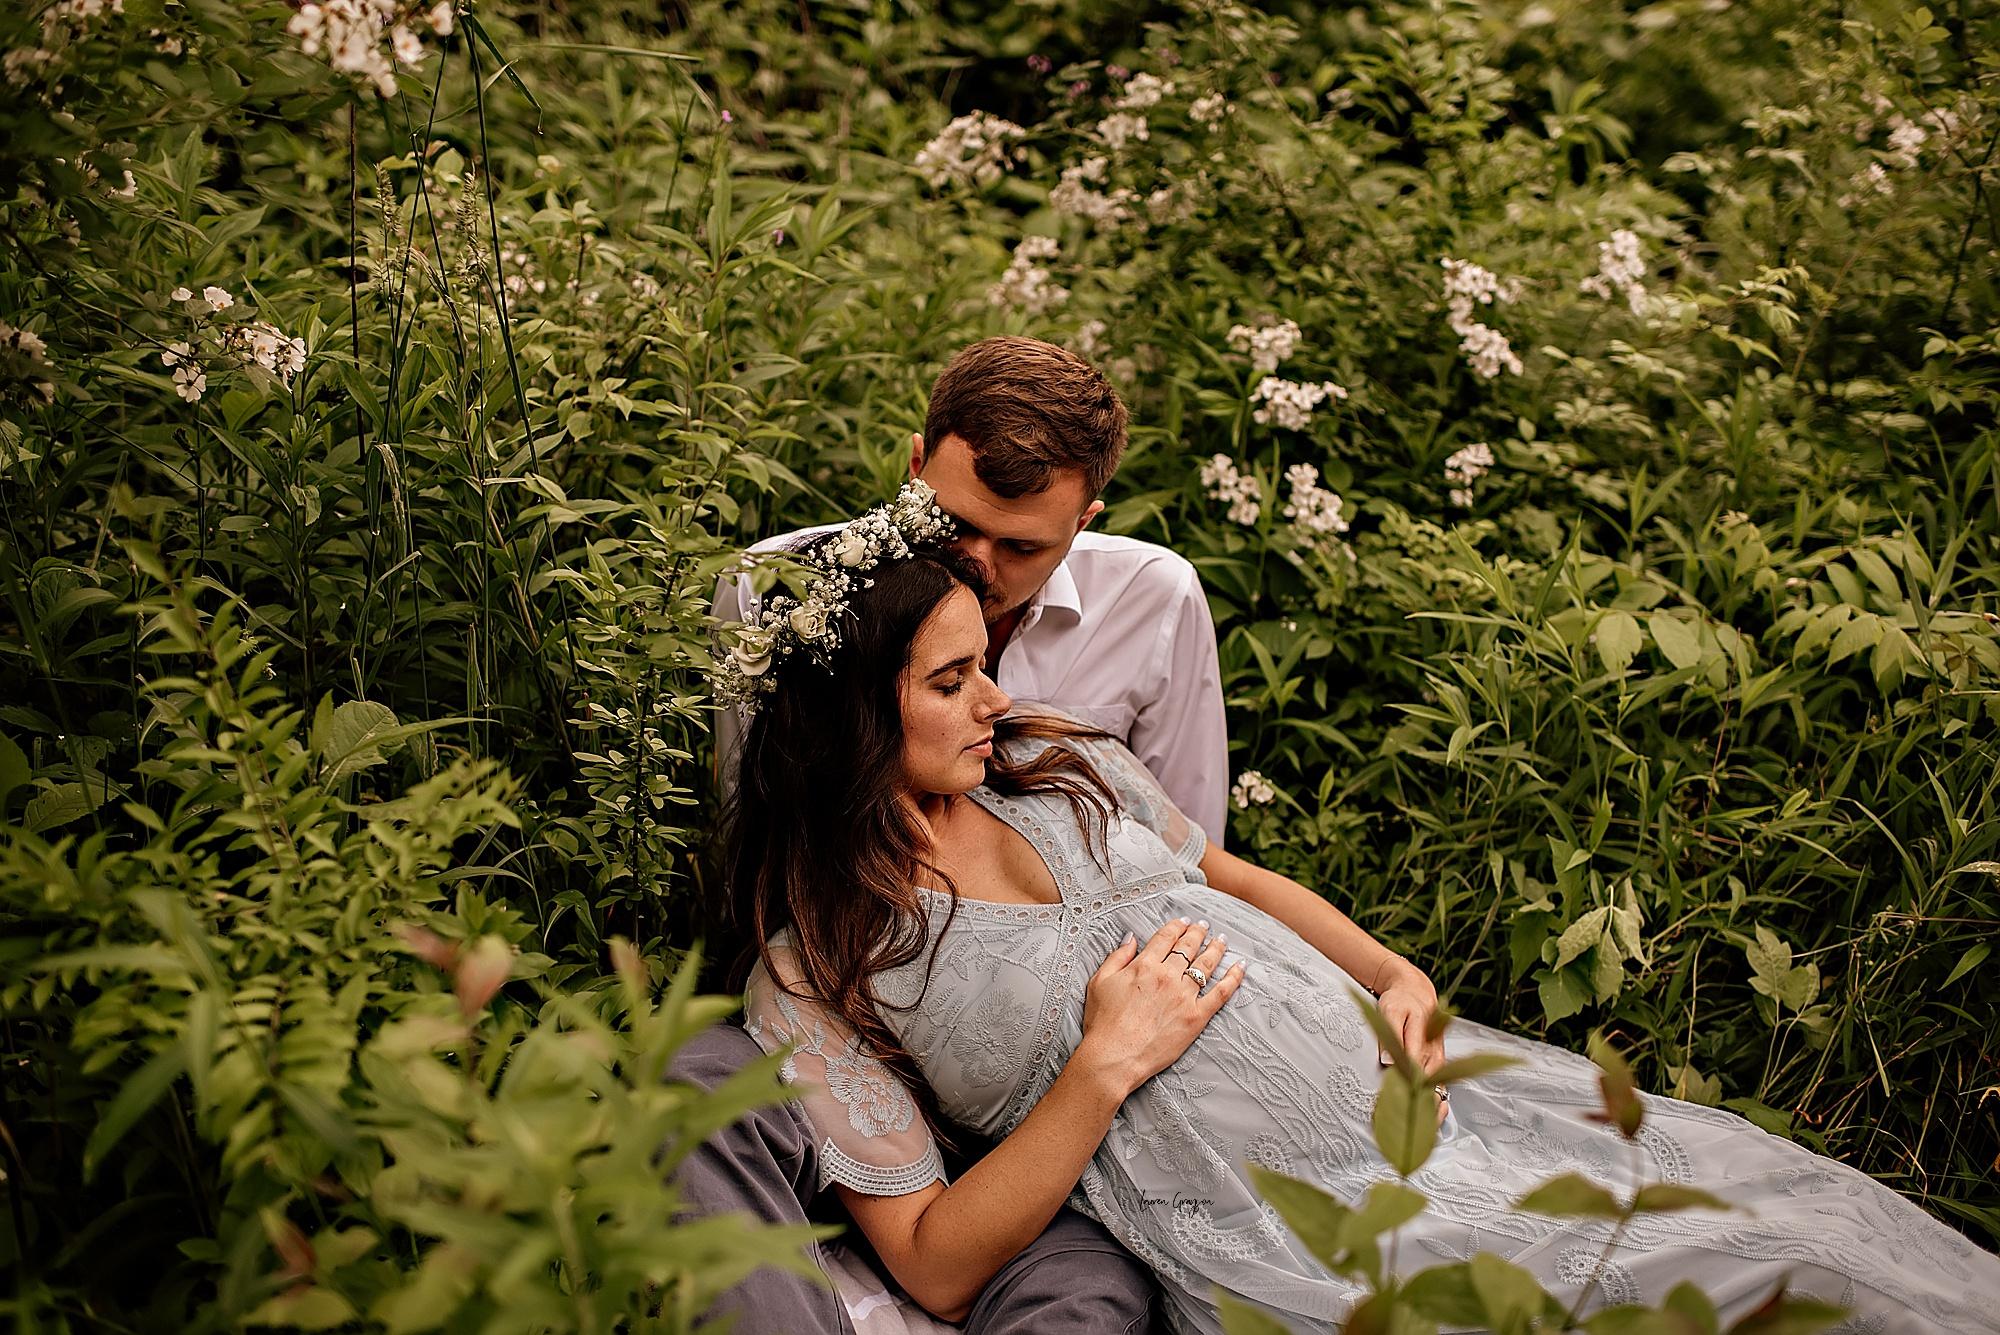 photographer canton ohio, maternity session